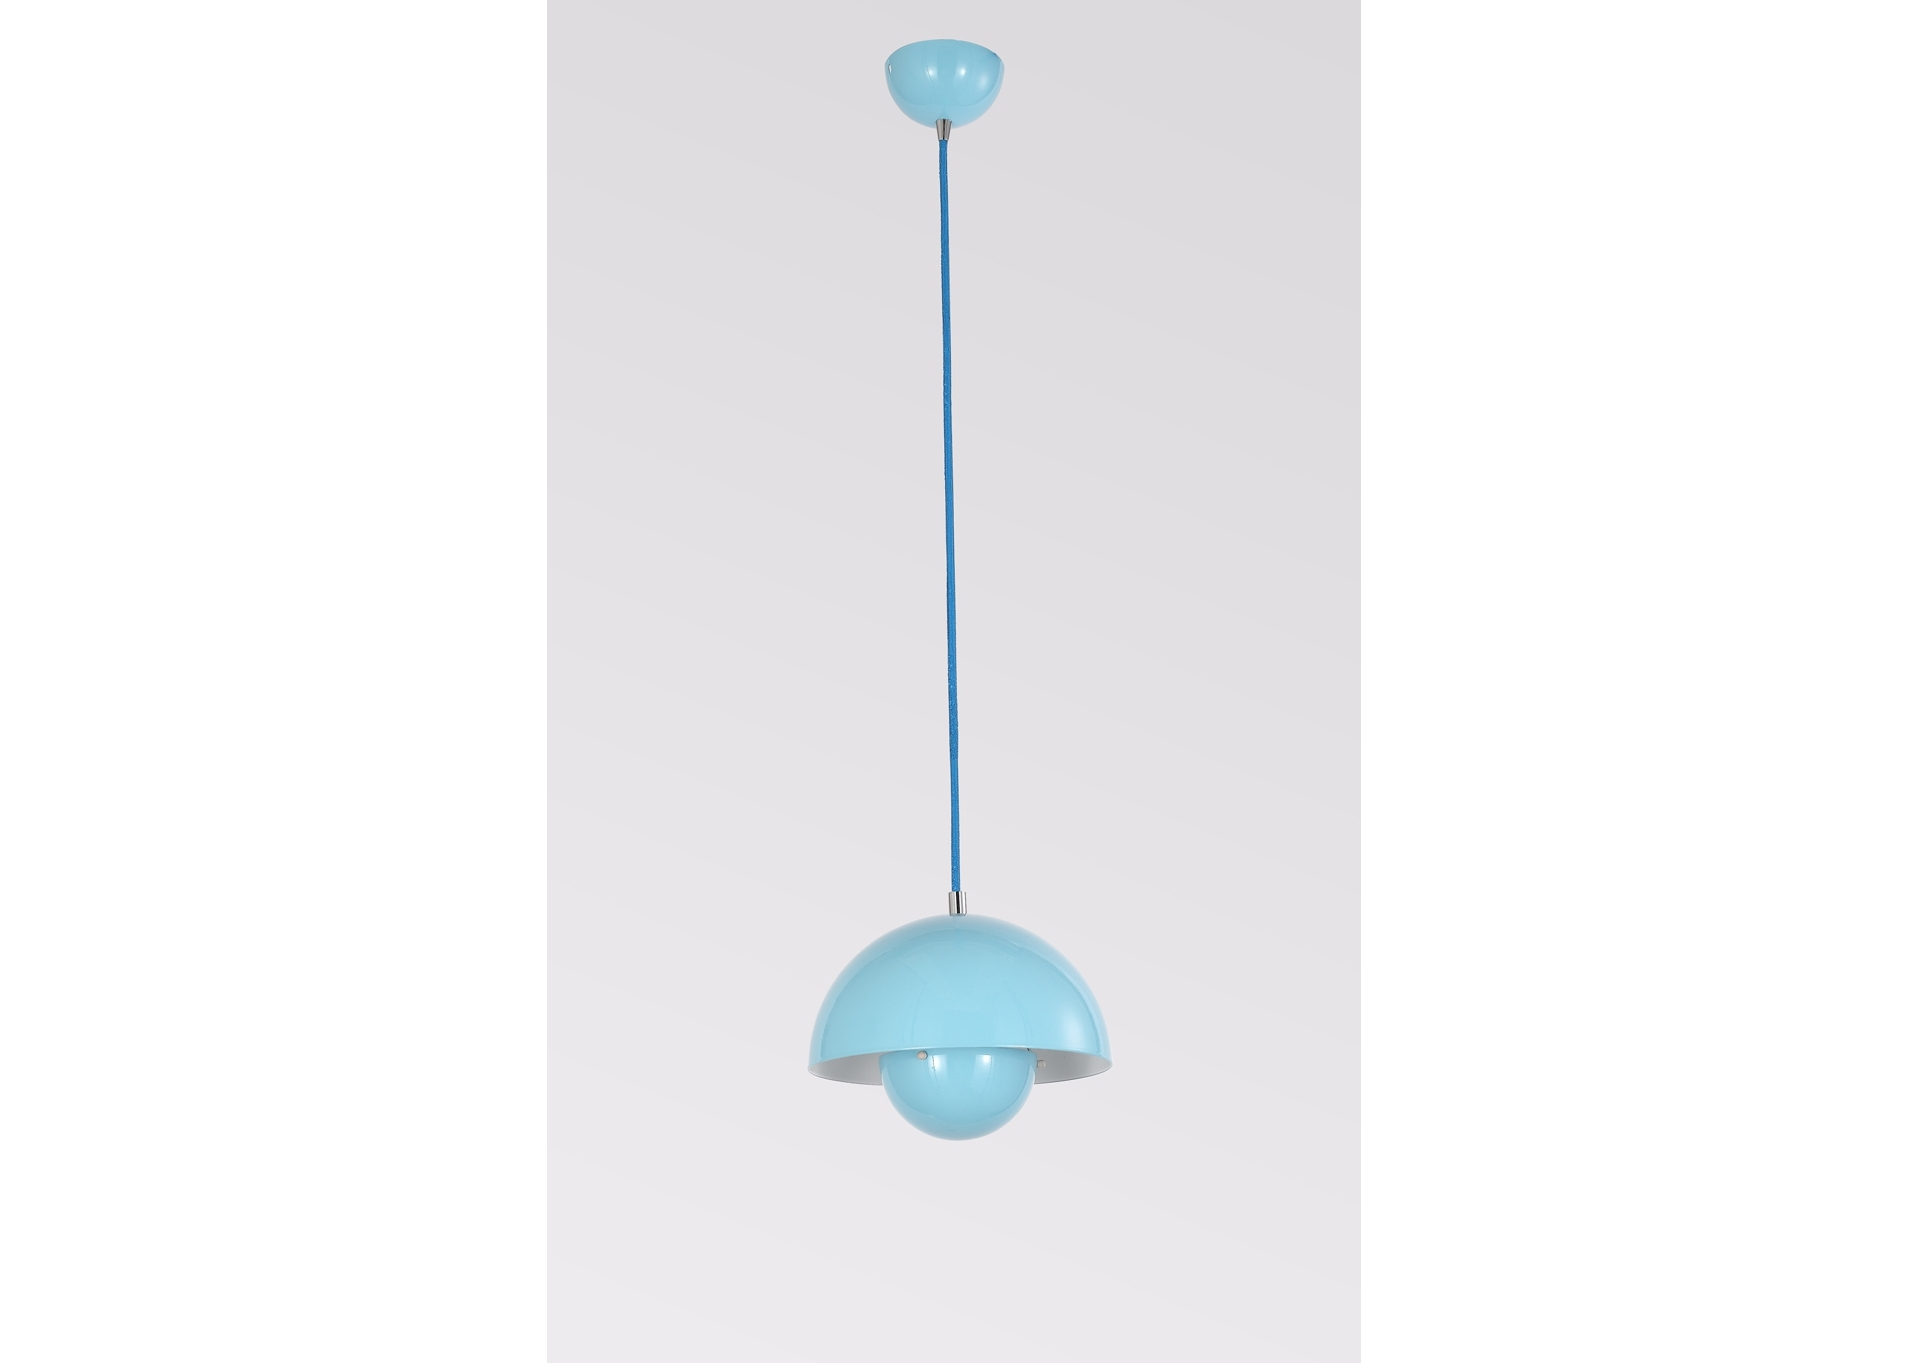 Подвесной светильник NarniПодвесные светильники<br>Материал: Металл<br>Design by Ketty Smith USA<br>Источник света: 1*60W (E27)<br>Особенности:<br>  а) Алюминий<br>  b) Цвет Blue&amp;nbsp;<br><br>kit: None<br>gender: None